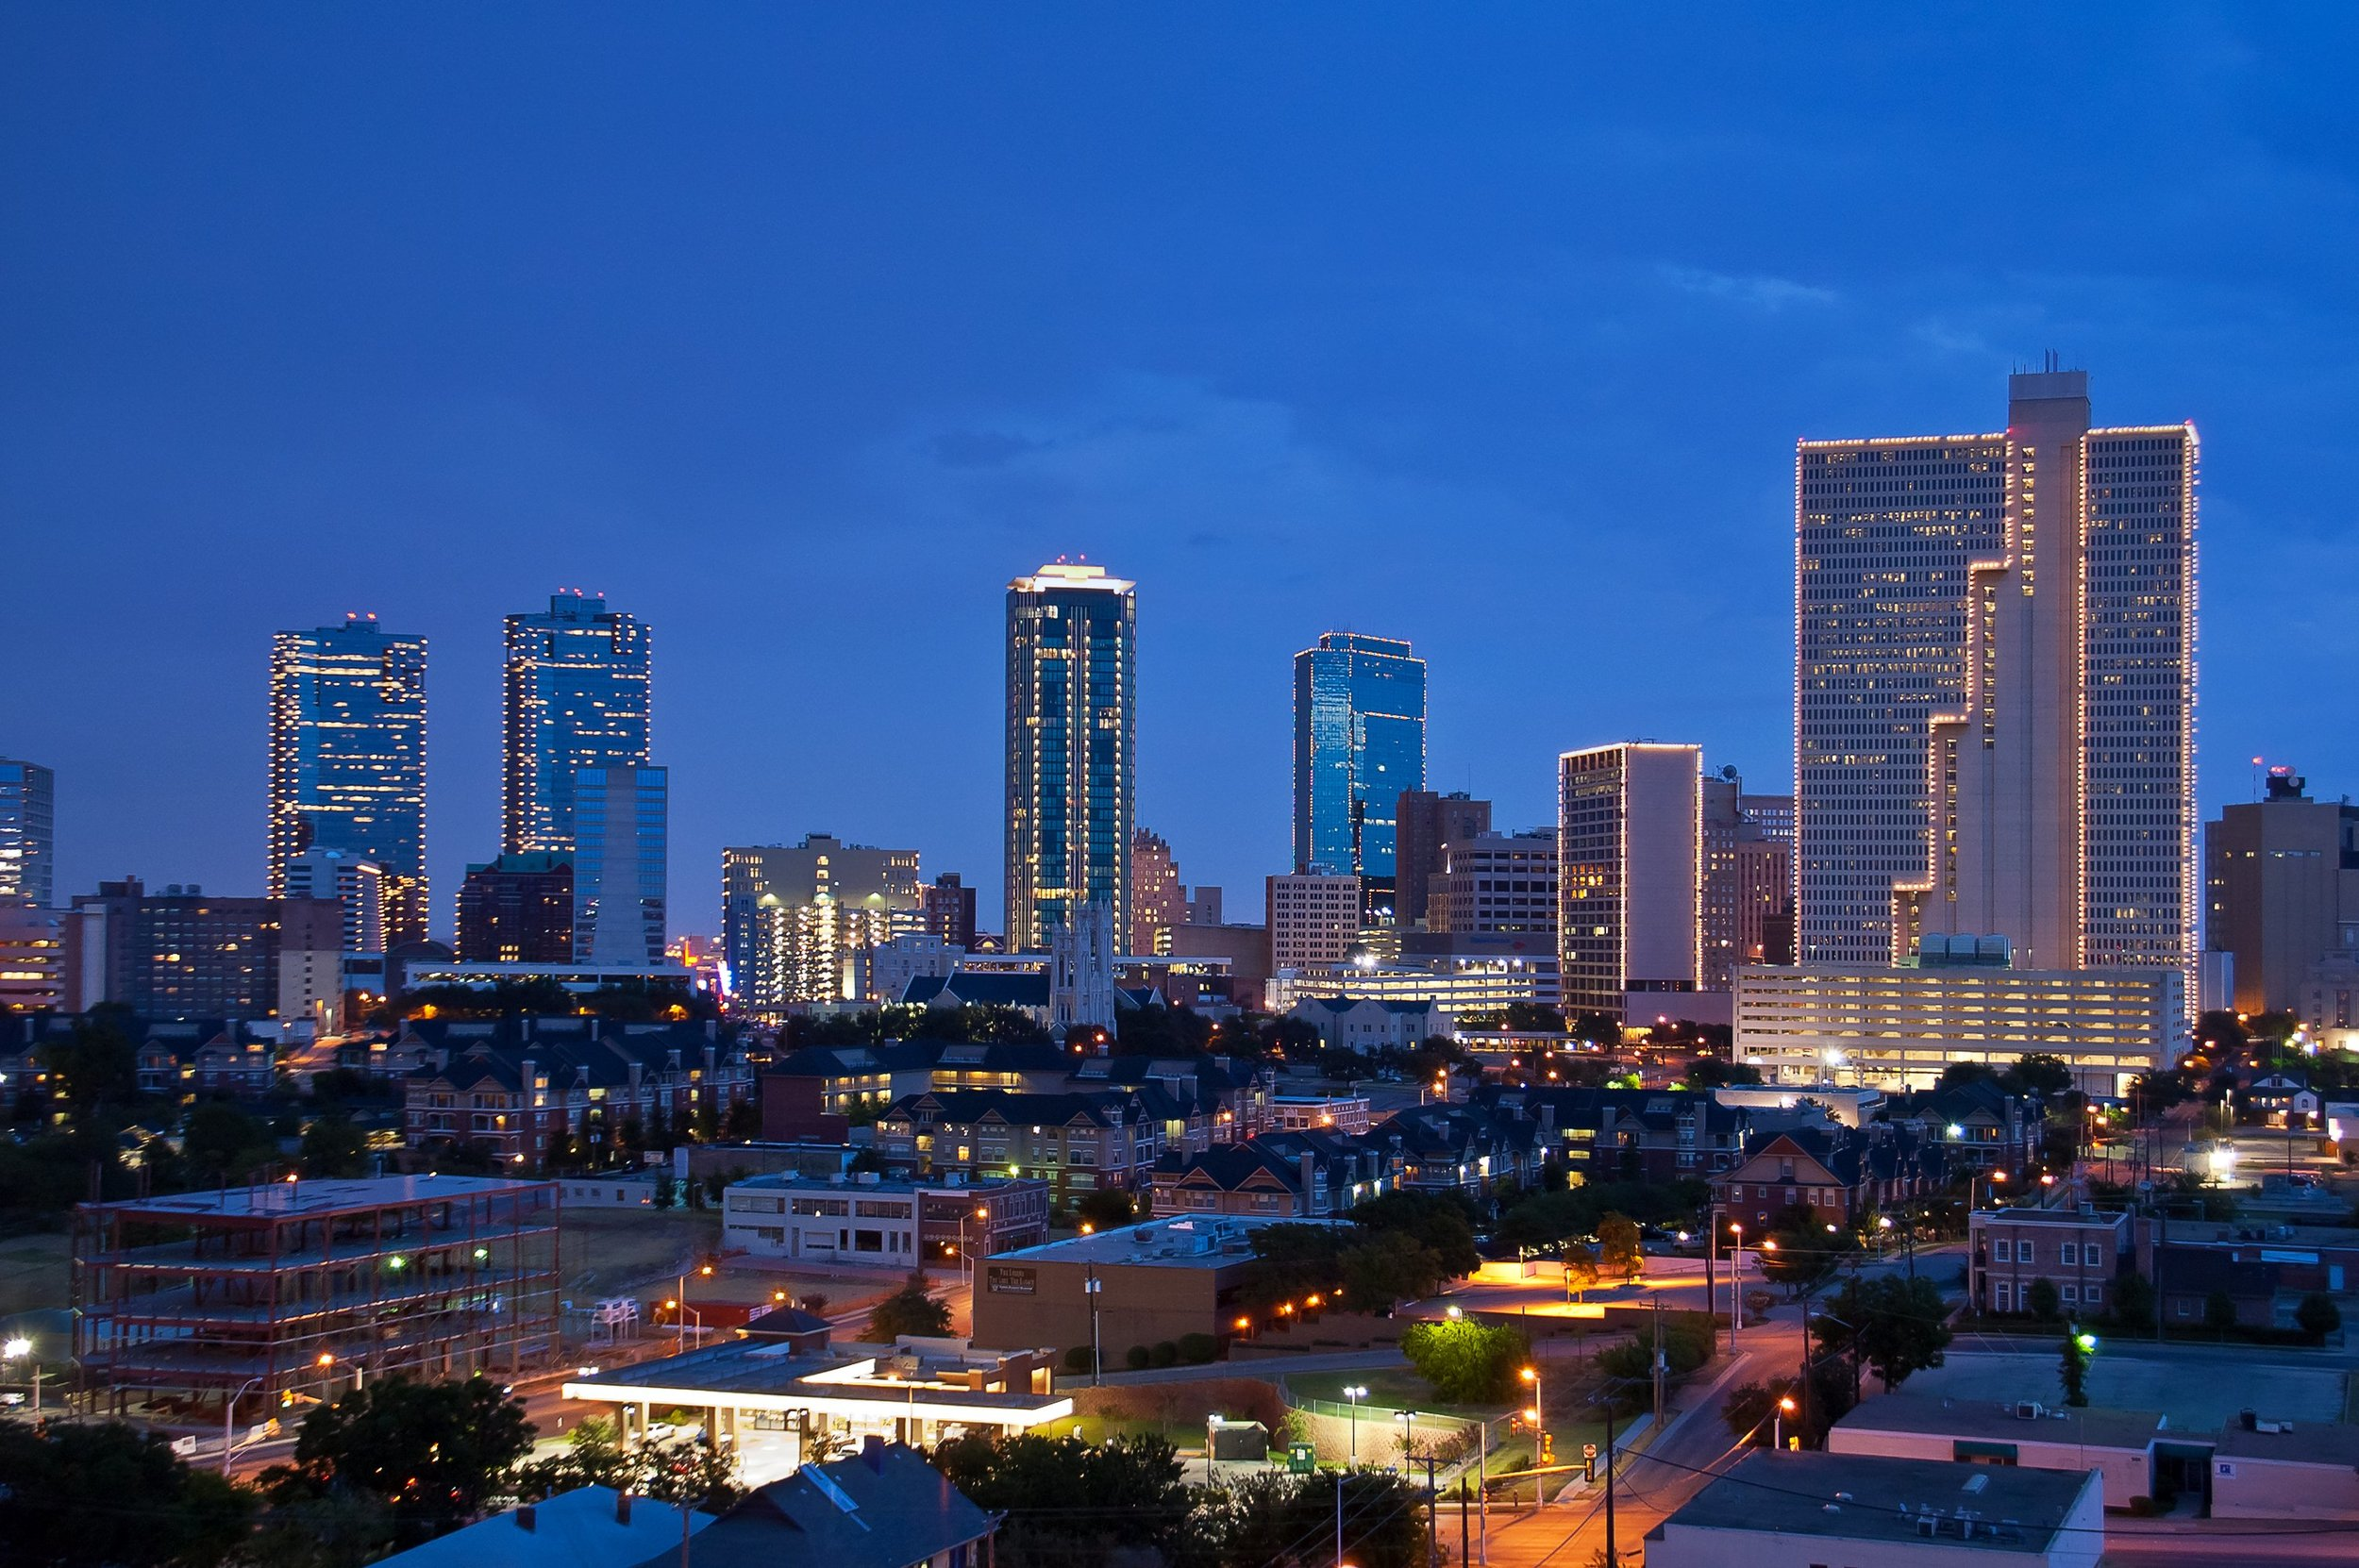 Downtown_Fort_Worth_Skyline_3008x2000.jpg